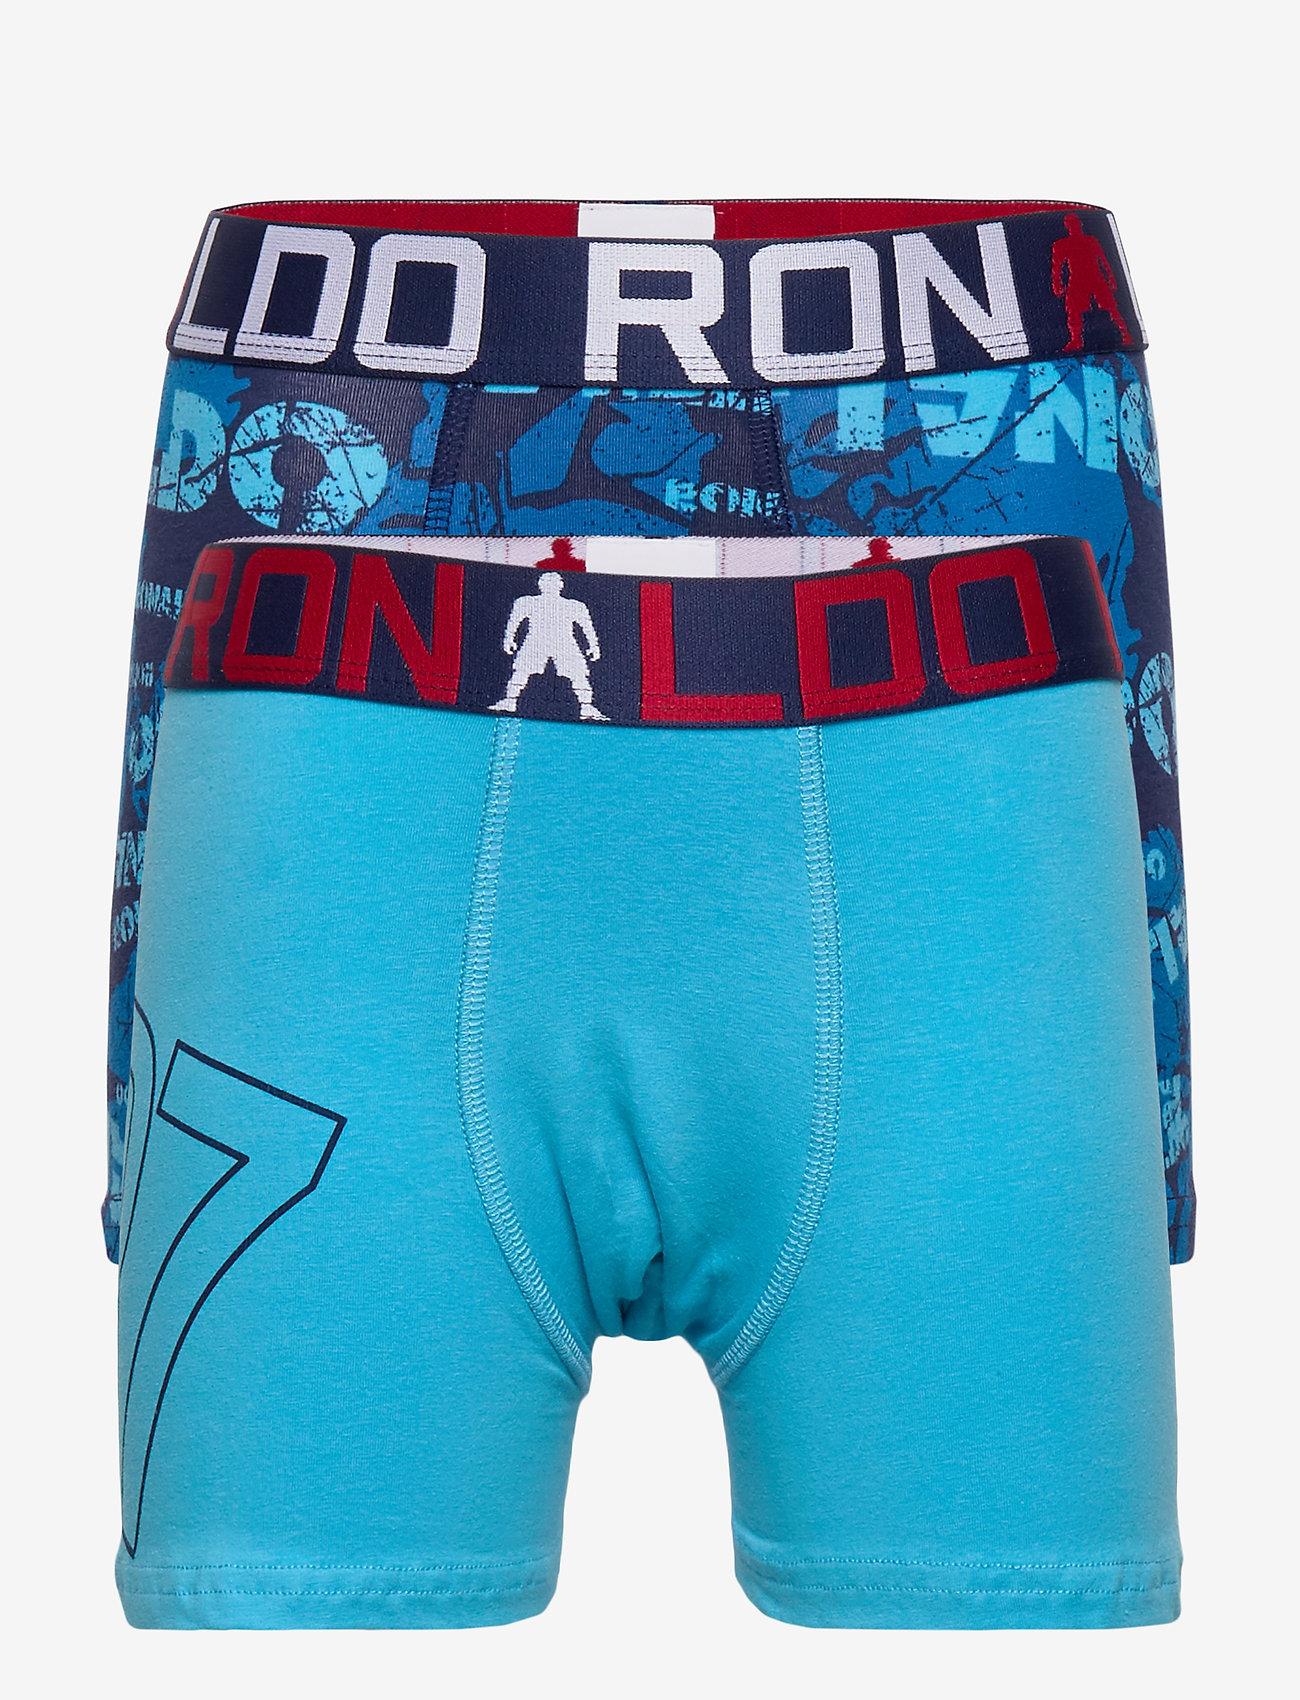 CR7 - CR7 Boy's Trunk 2-pack - shorts et pantalons - multi - 0